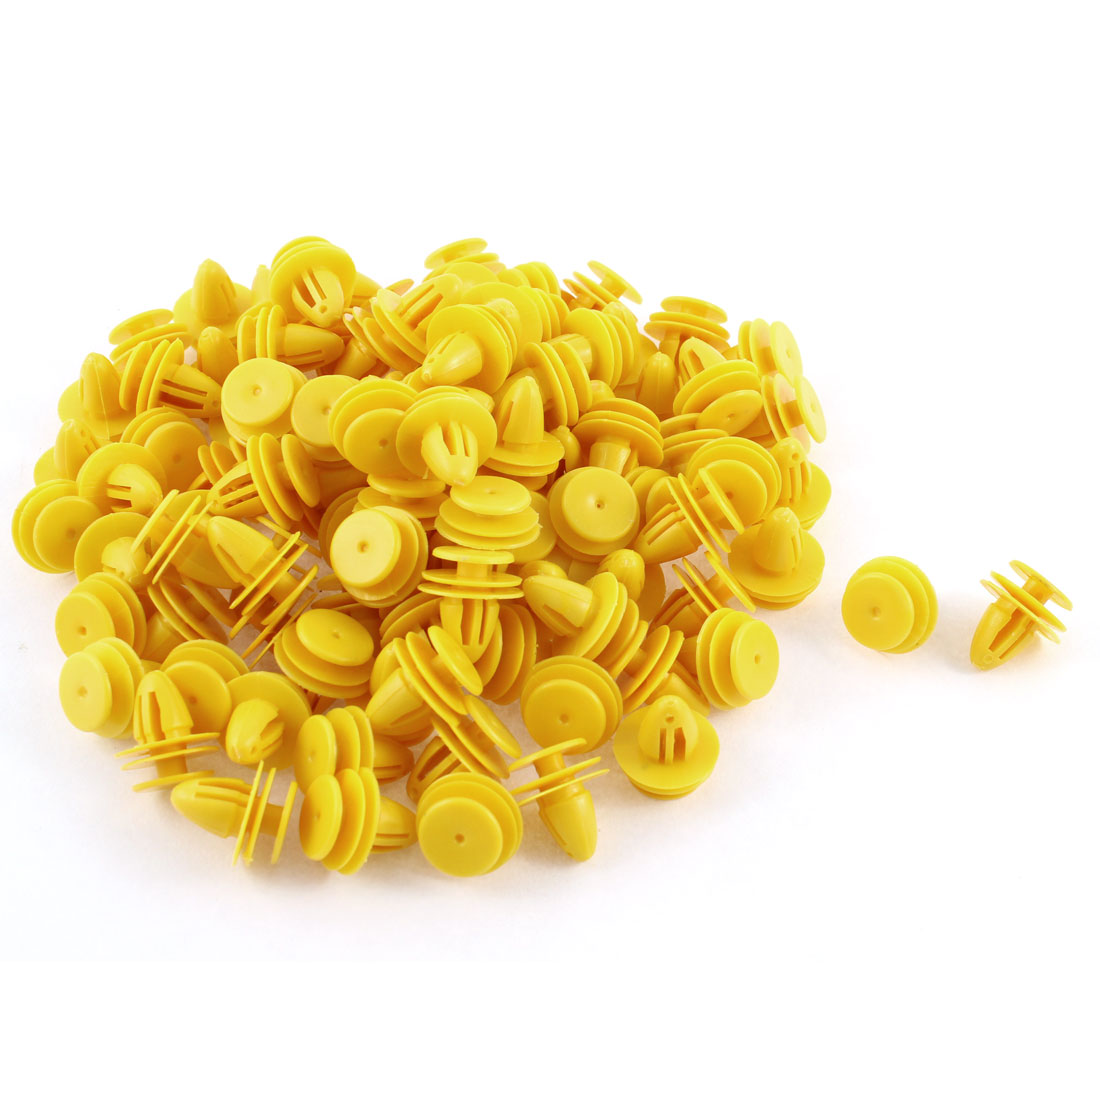 100 Pcs Yellow Plastic Rivet Trim Fastener Retainer Clips 9mm x 11mm x 15mm